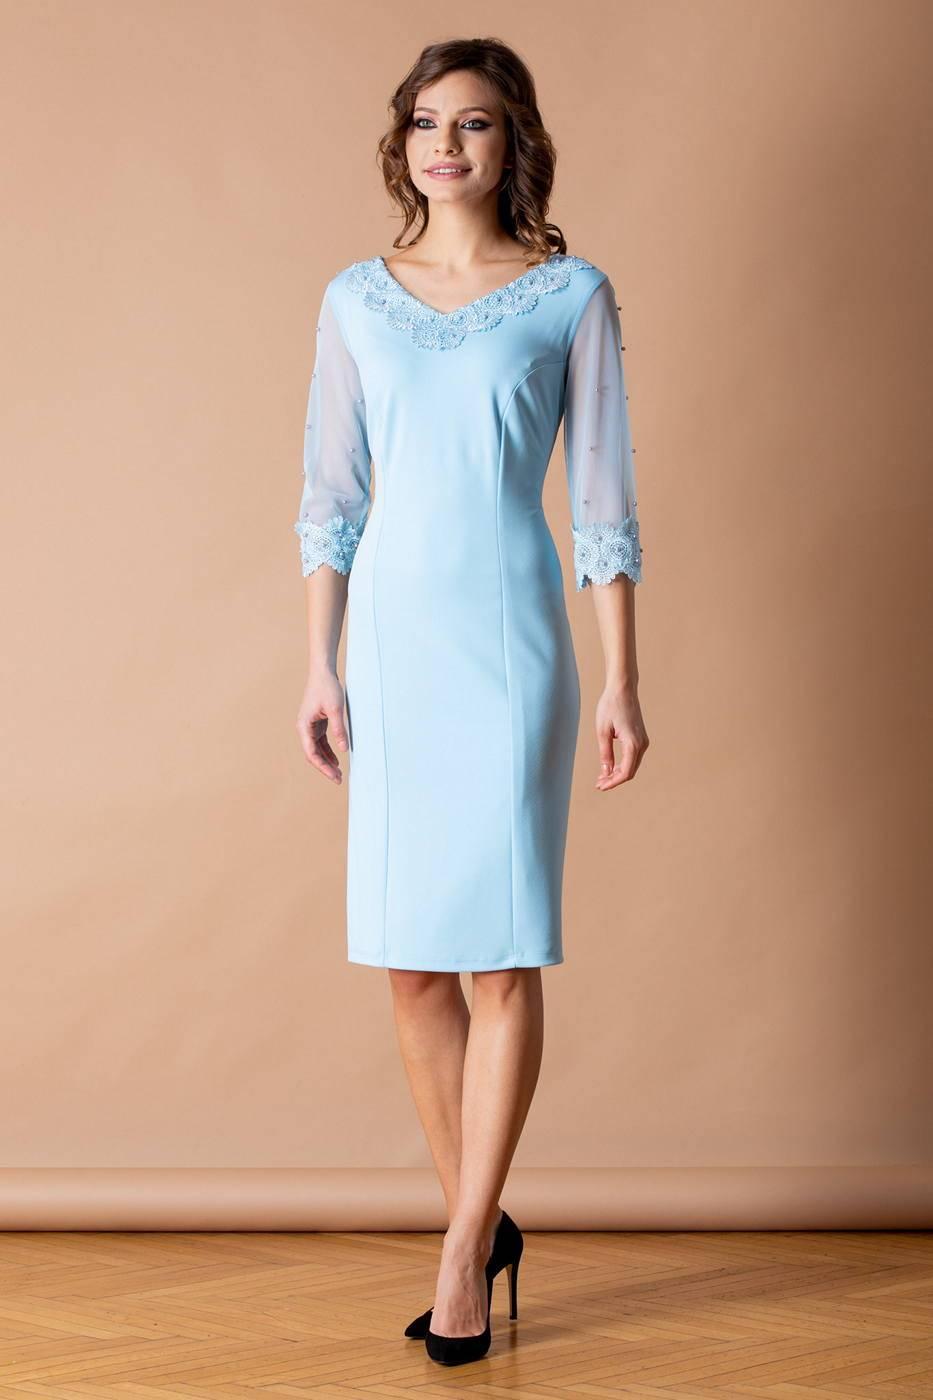 Ronny Γαλάζιο Φόρεμα 2235